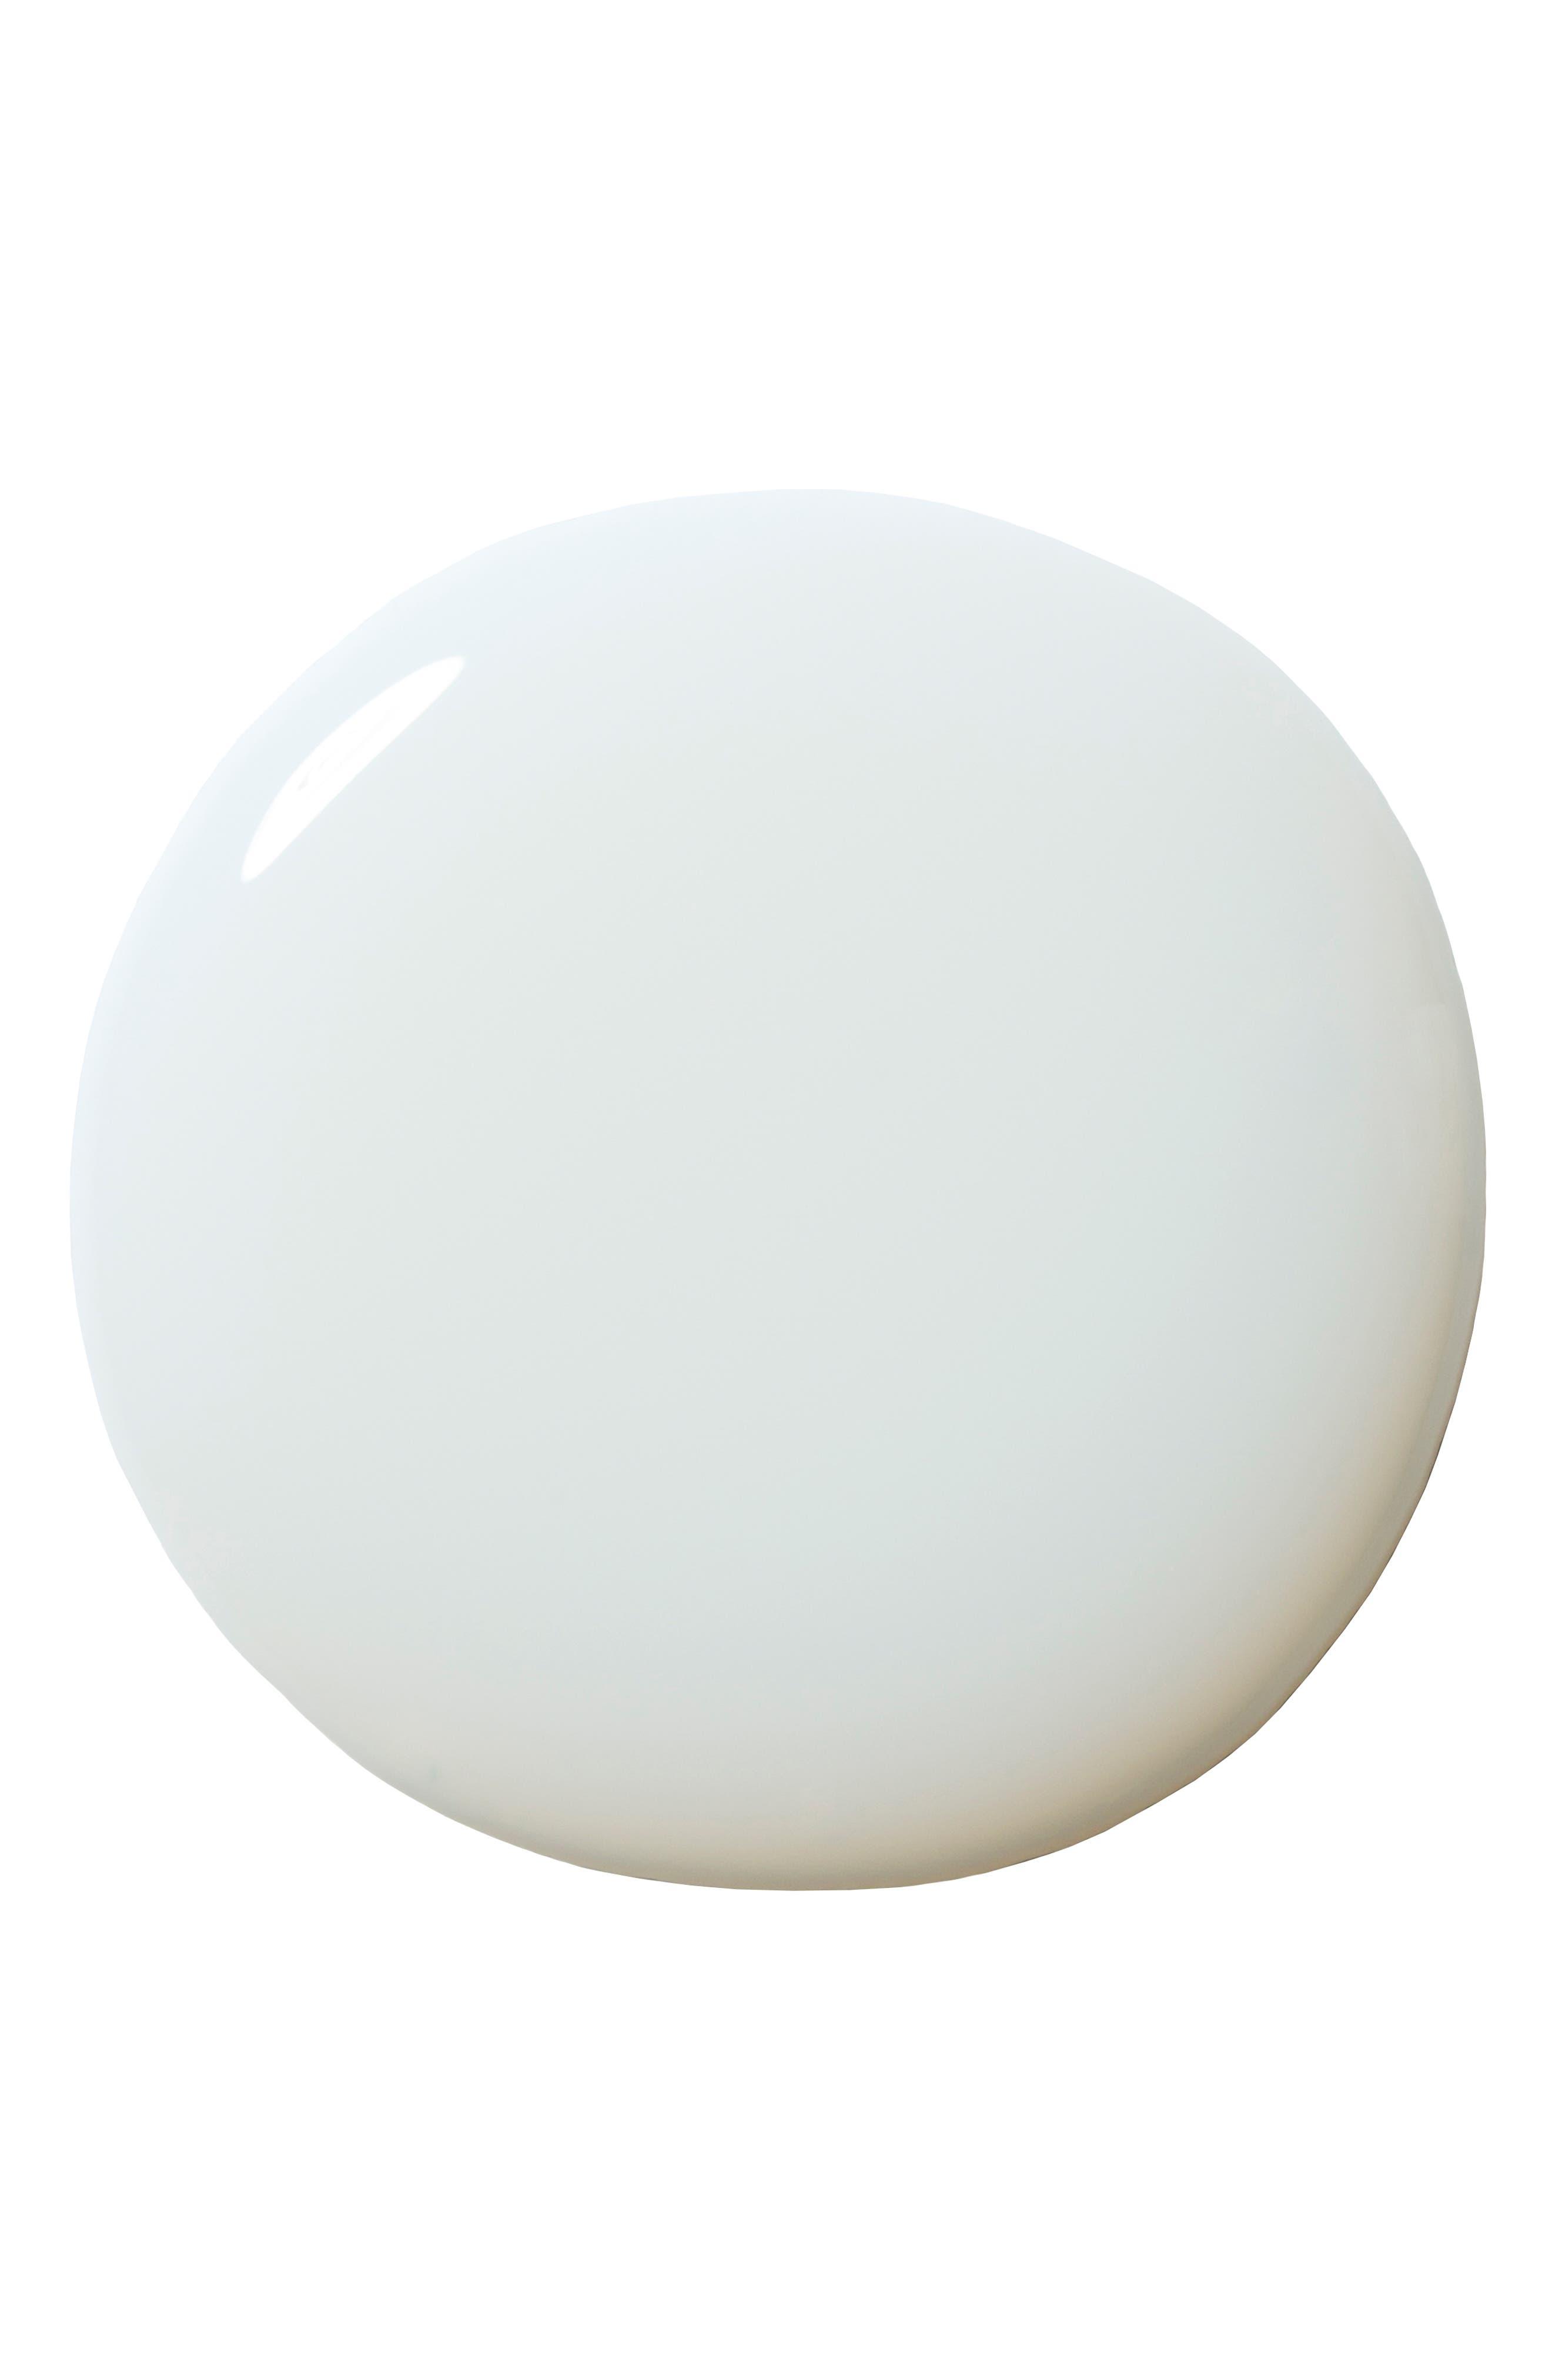 Egg-ssential Fluid Toner,                             Alternate thumbnail 2, color,                             NO COLOR